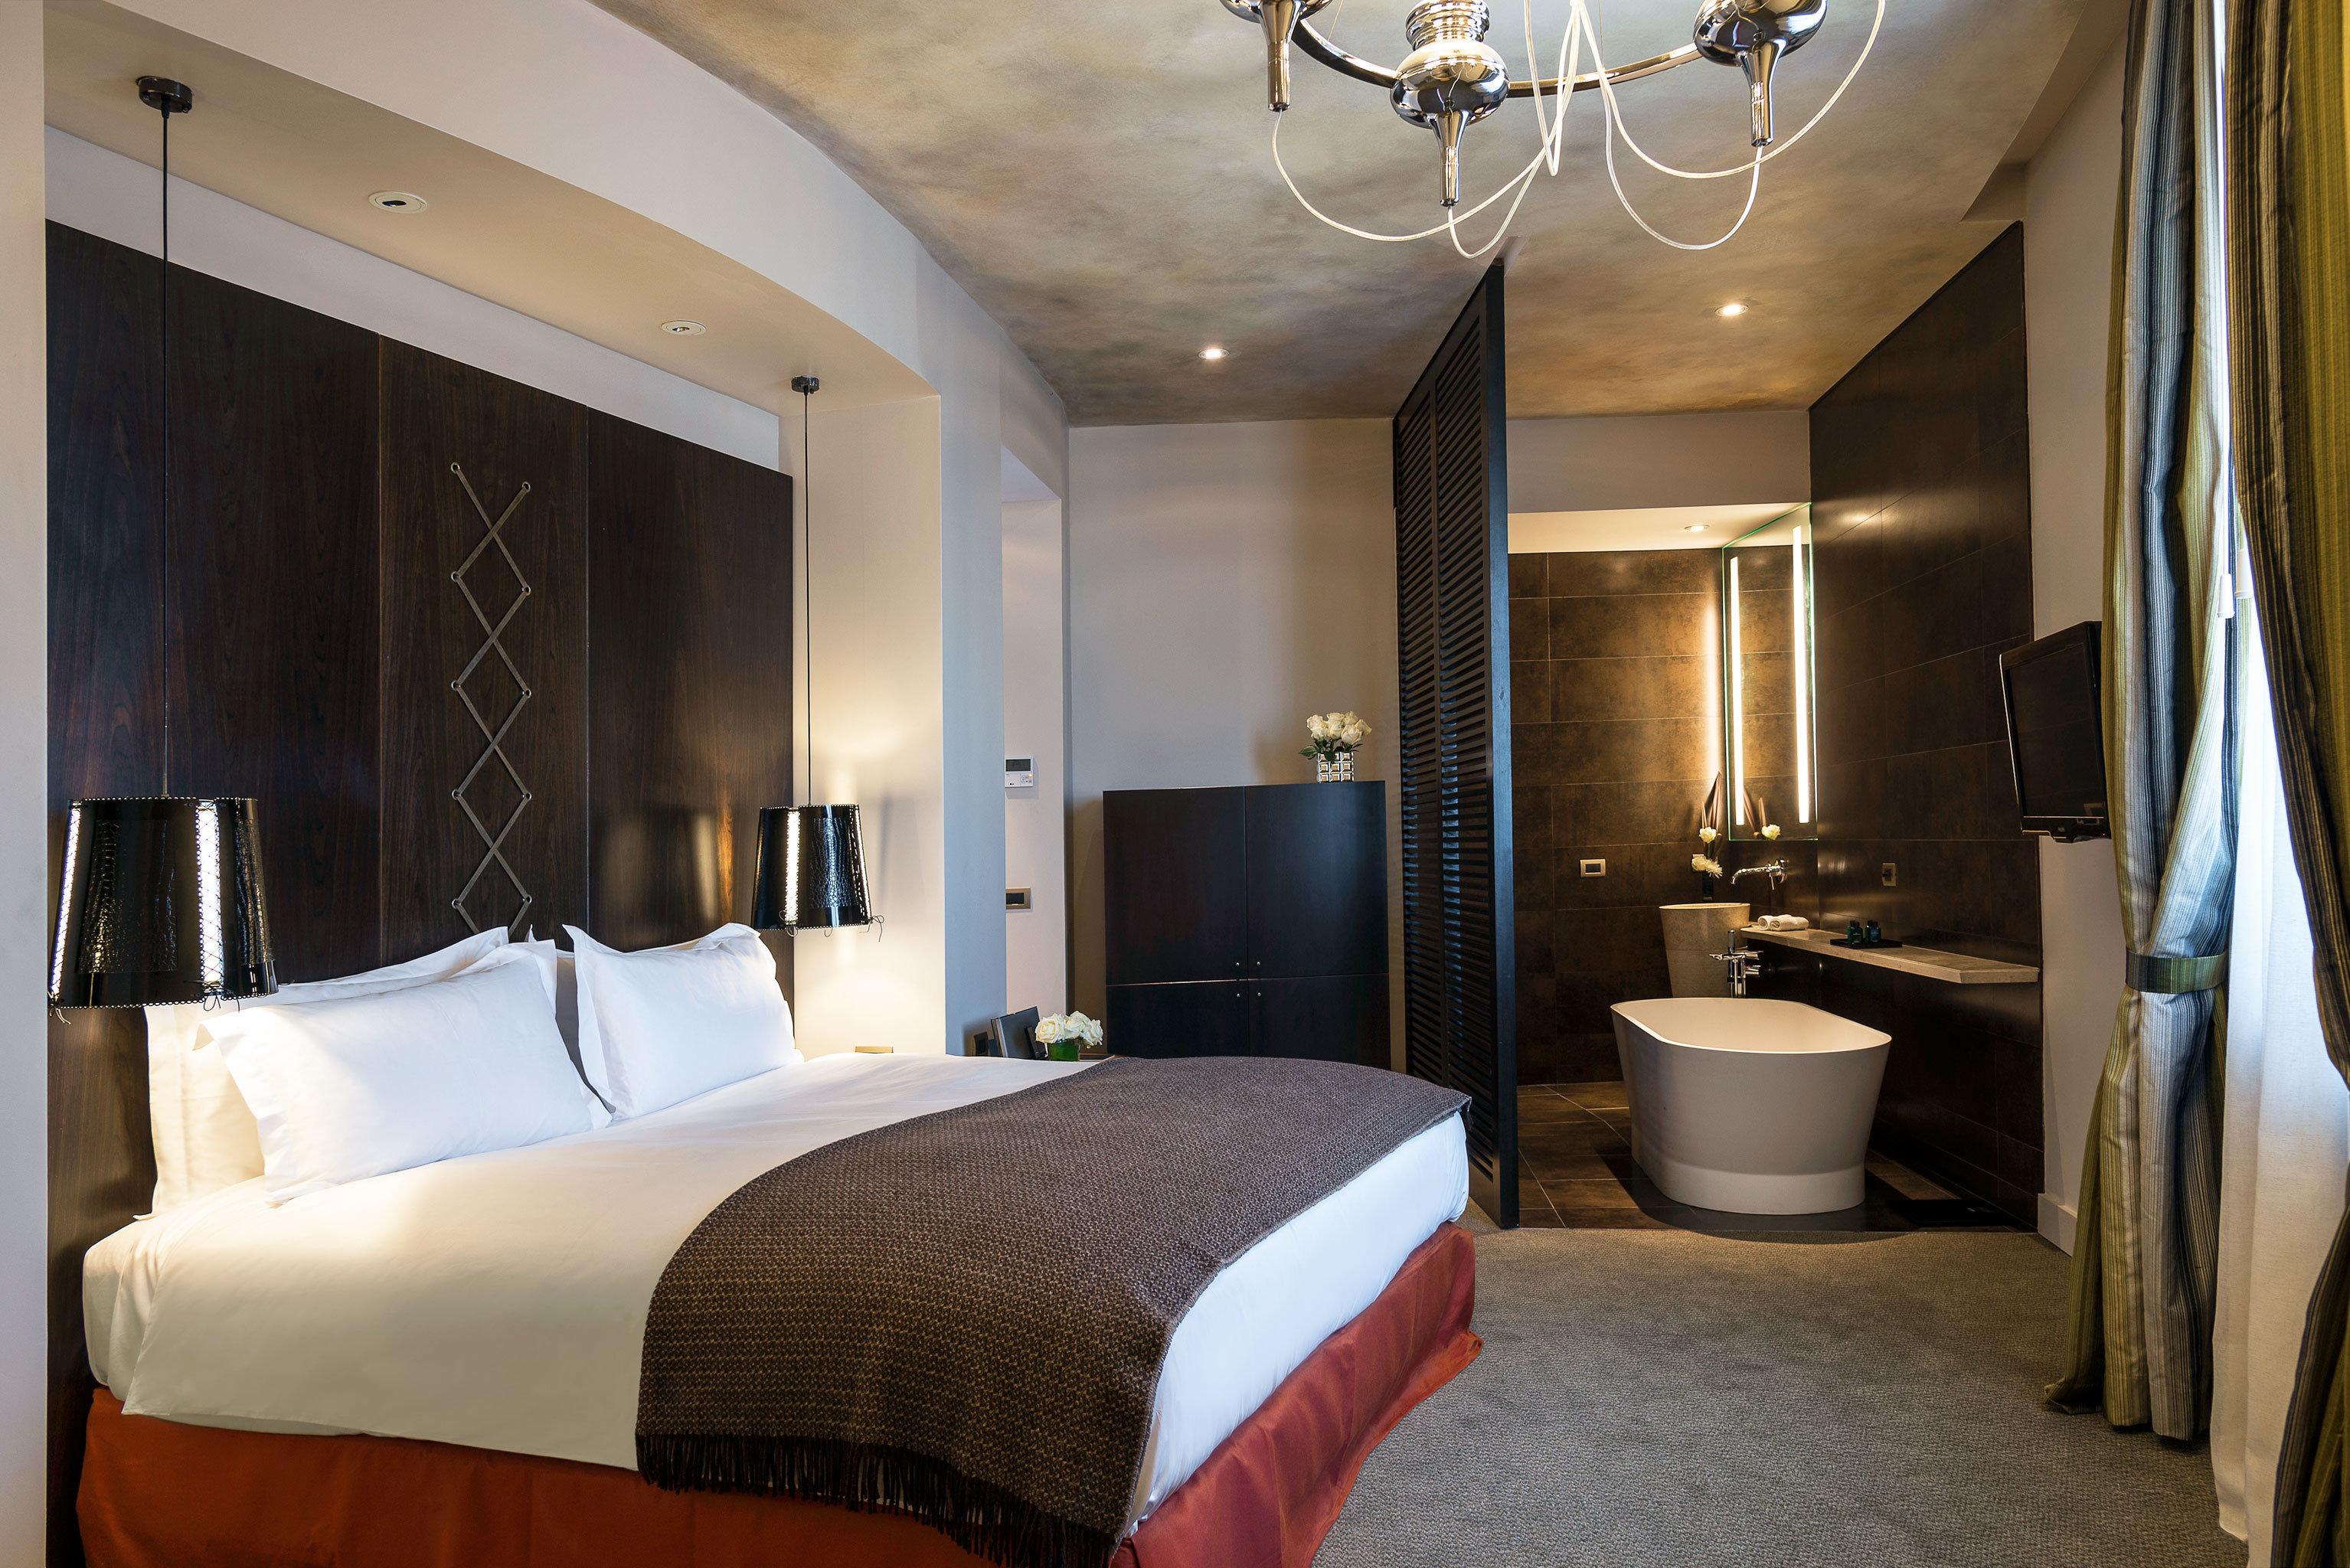 Bedroom Classic Luxury Resort sofa property Suite cottage Modern